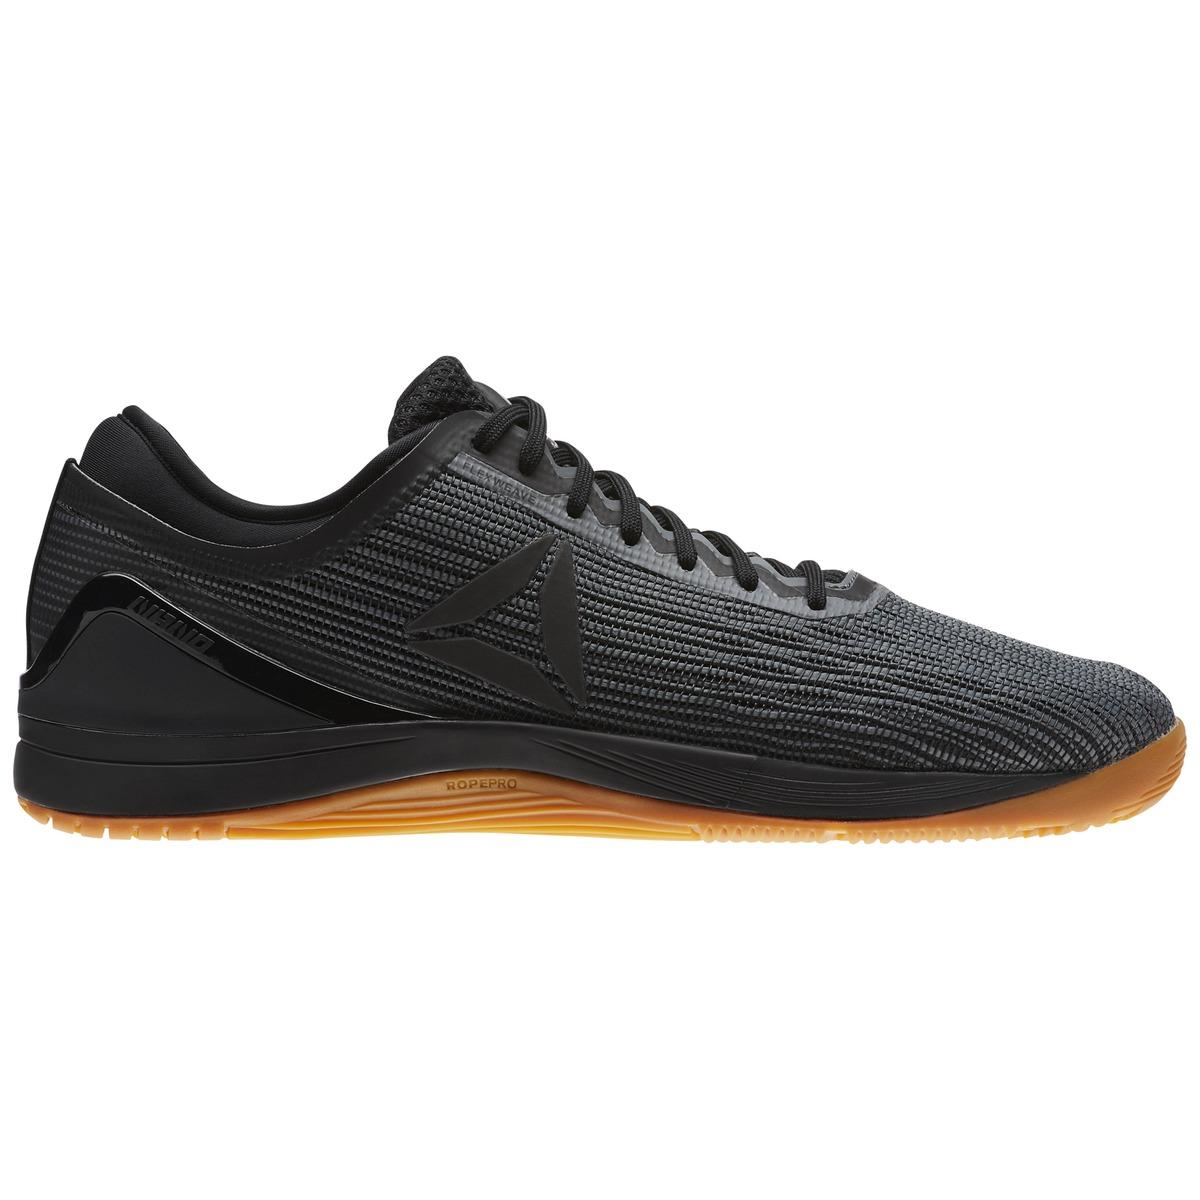 Reebok Crossfit Nano 8, miesten crossfit-kengät - Miesten treenikengät | XXL